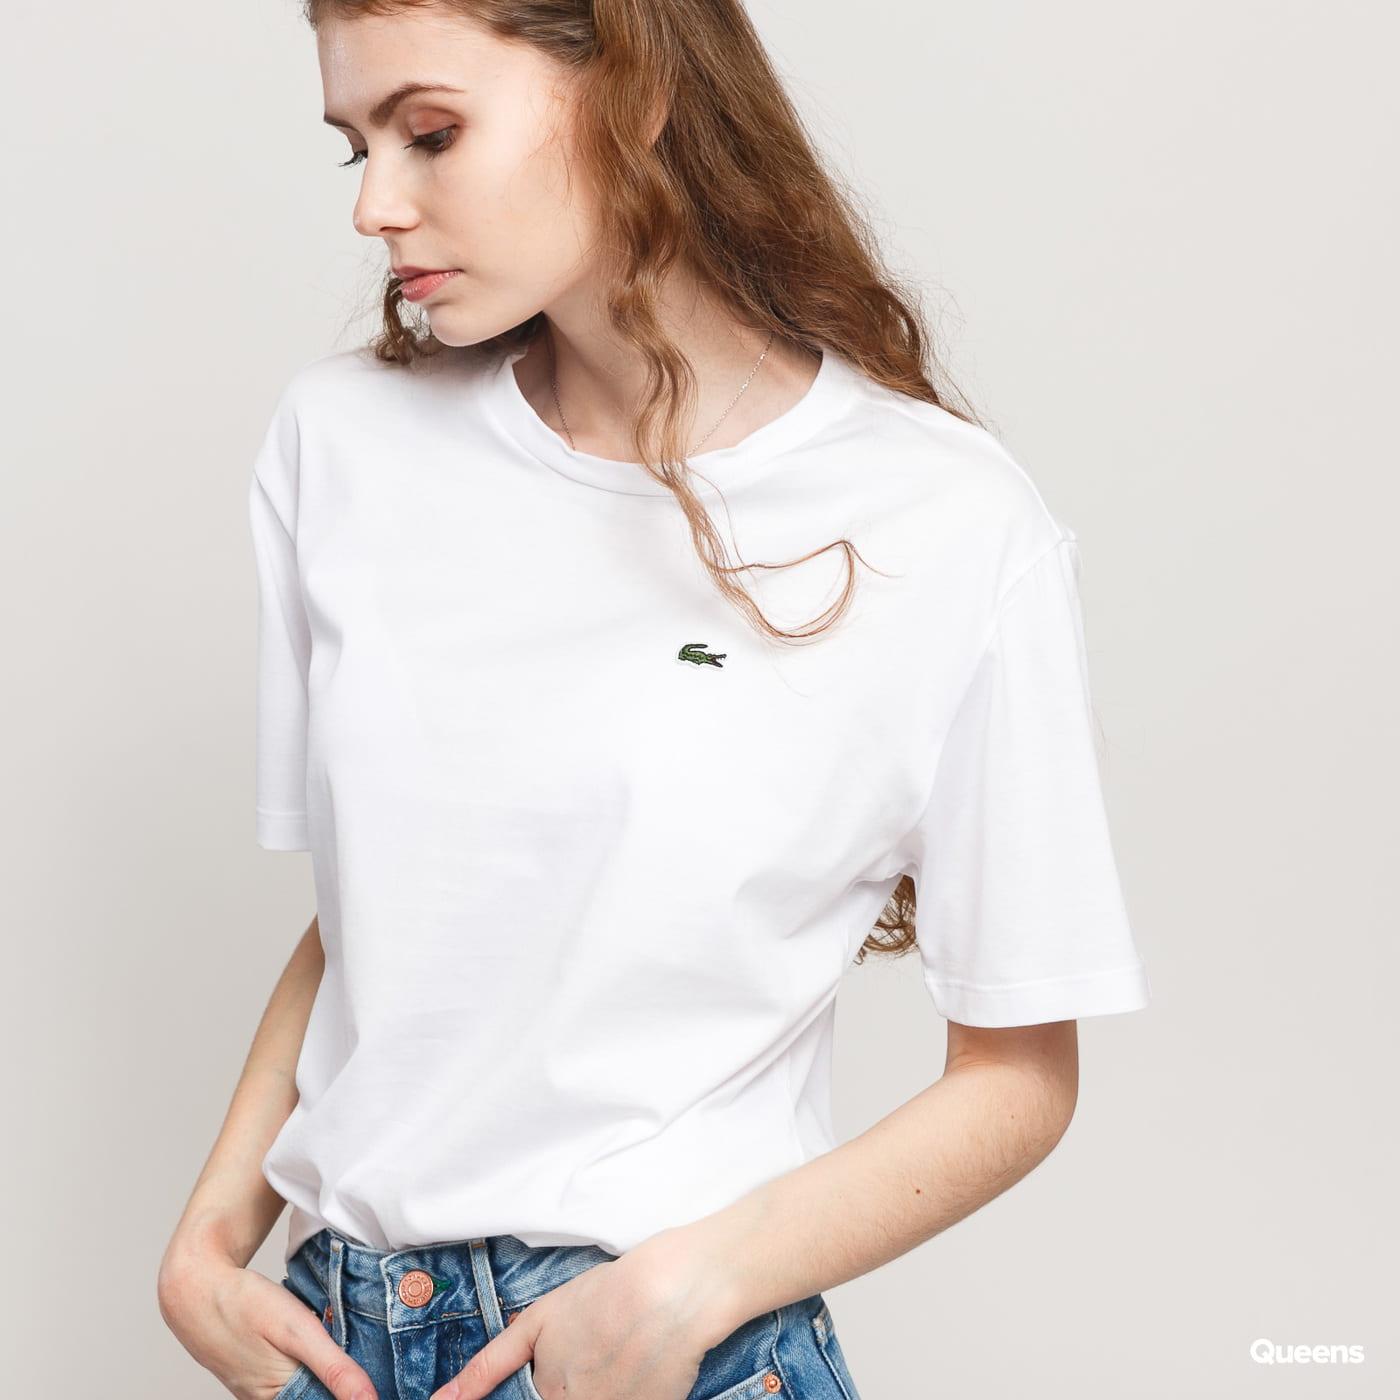 LACOSTE Women's T-Shirt blue / turquoise